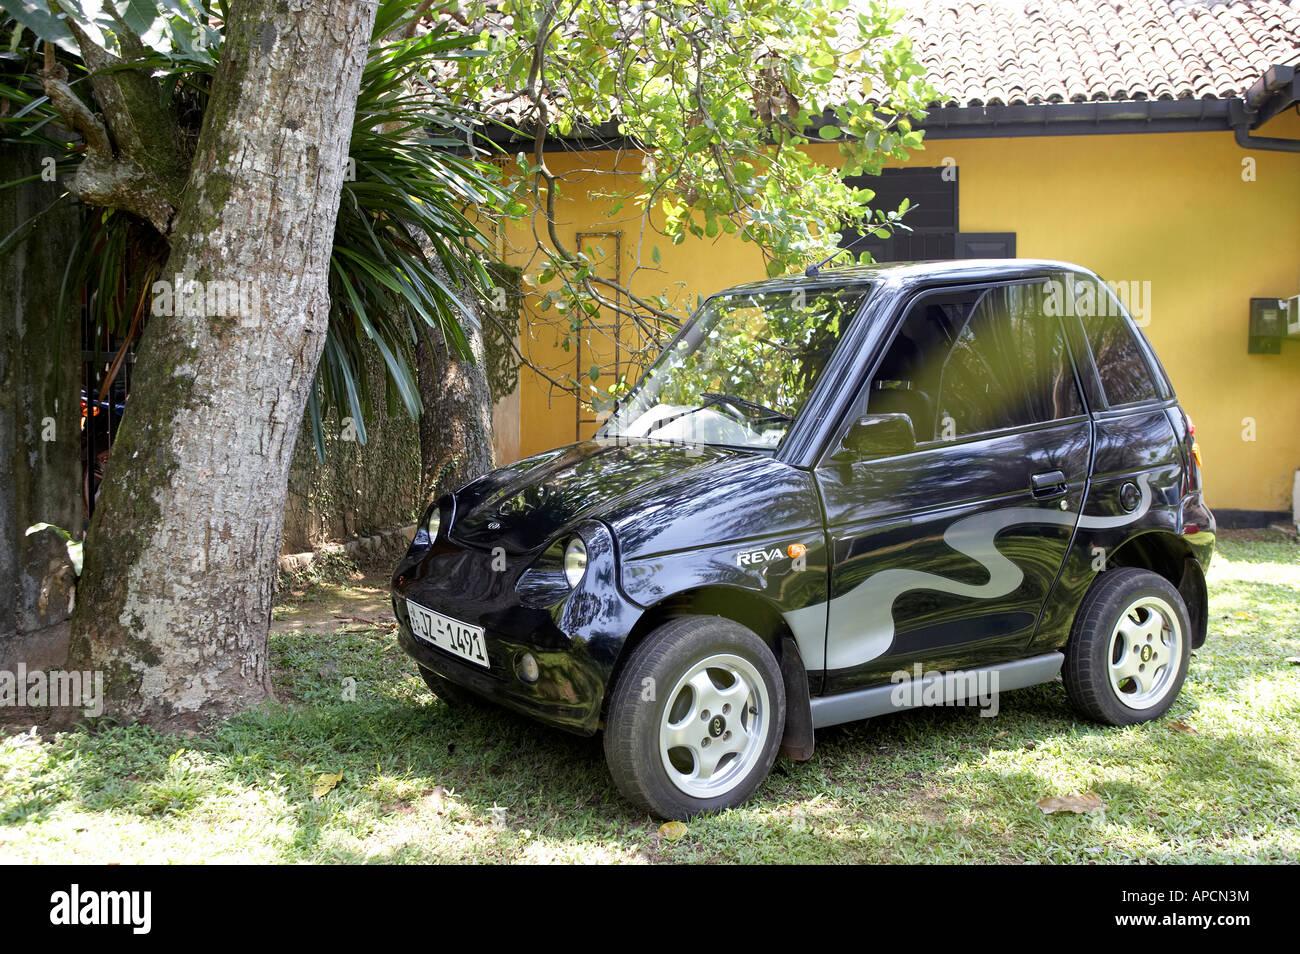 Furniture Workshop Sri Lanka Green Electric Car Stock Photo